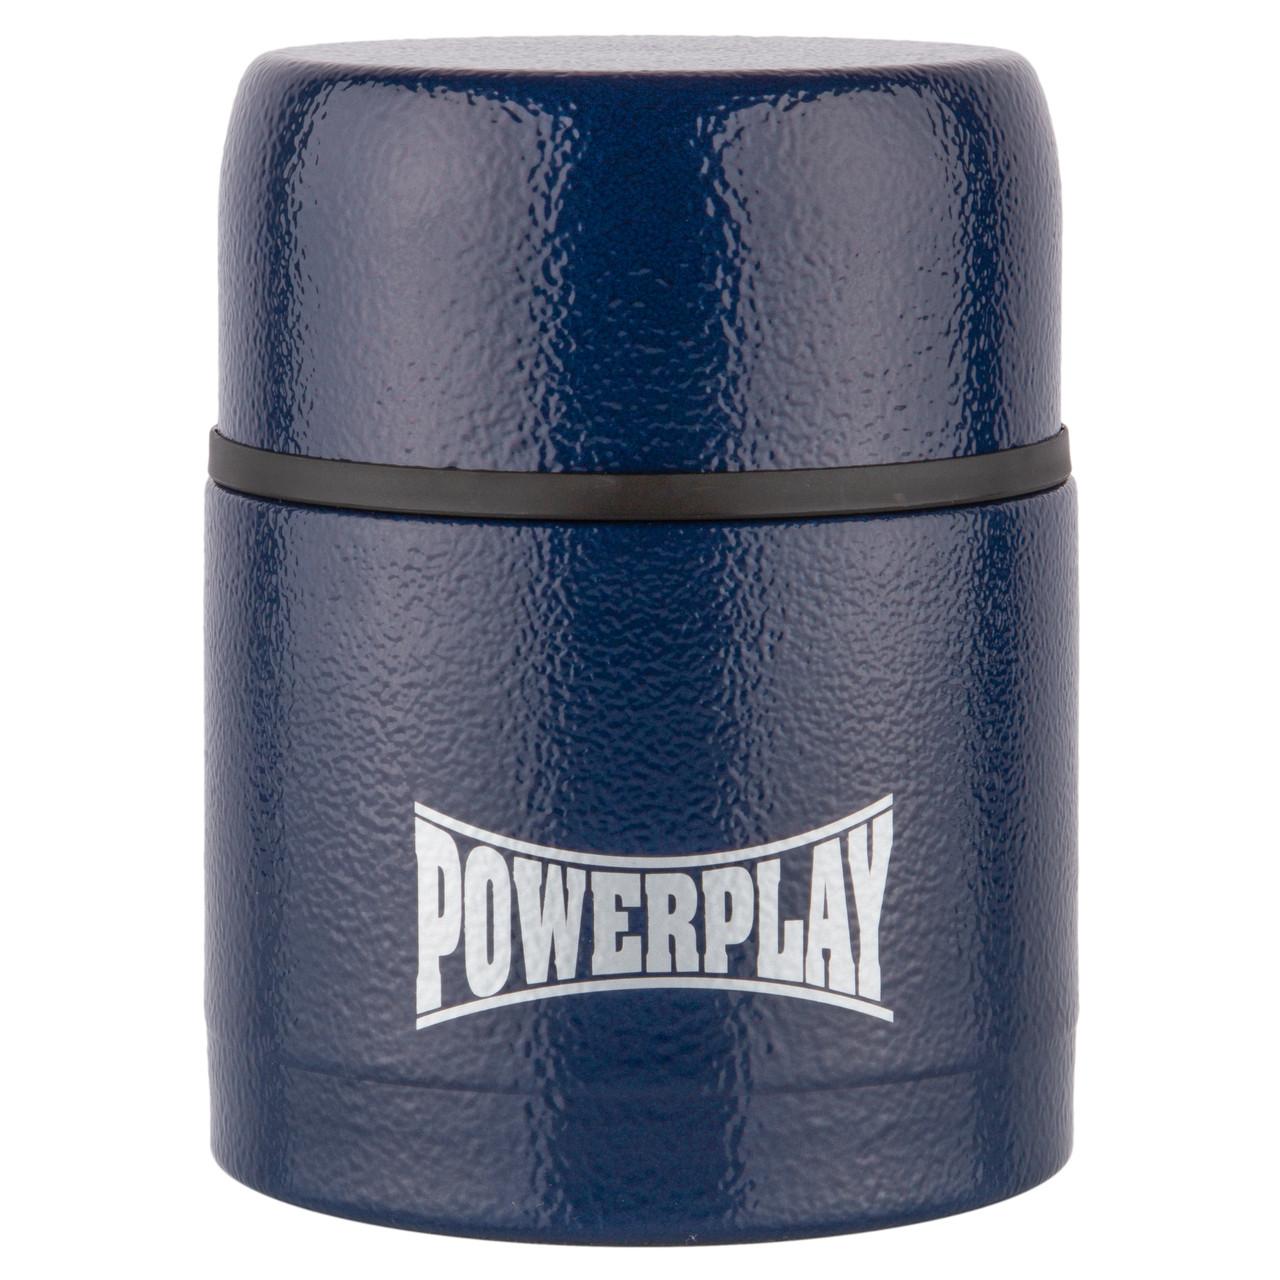 Маленький термос пищевой синий 500 мл PowerPlay 9003